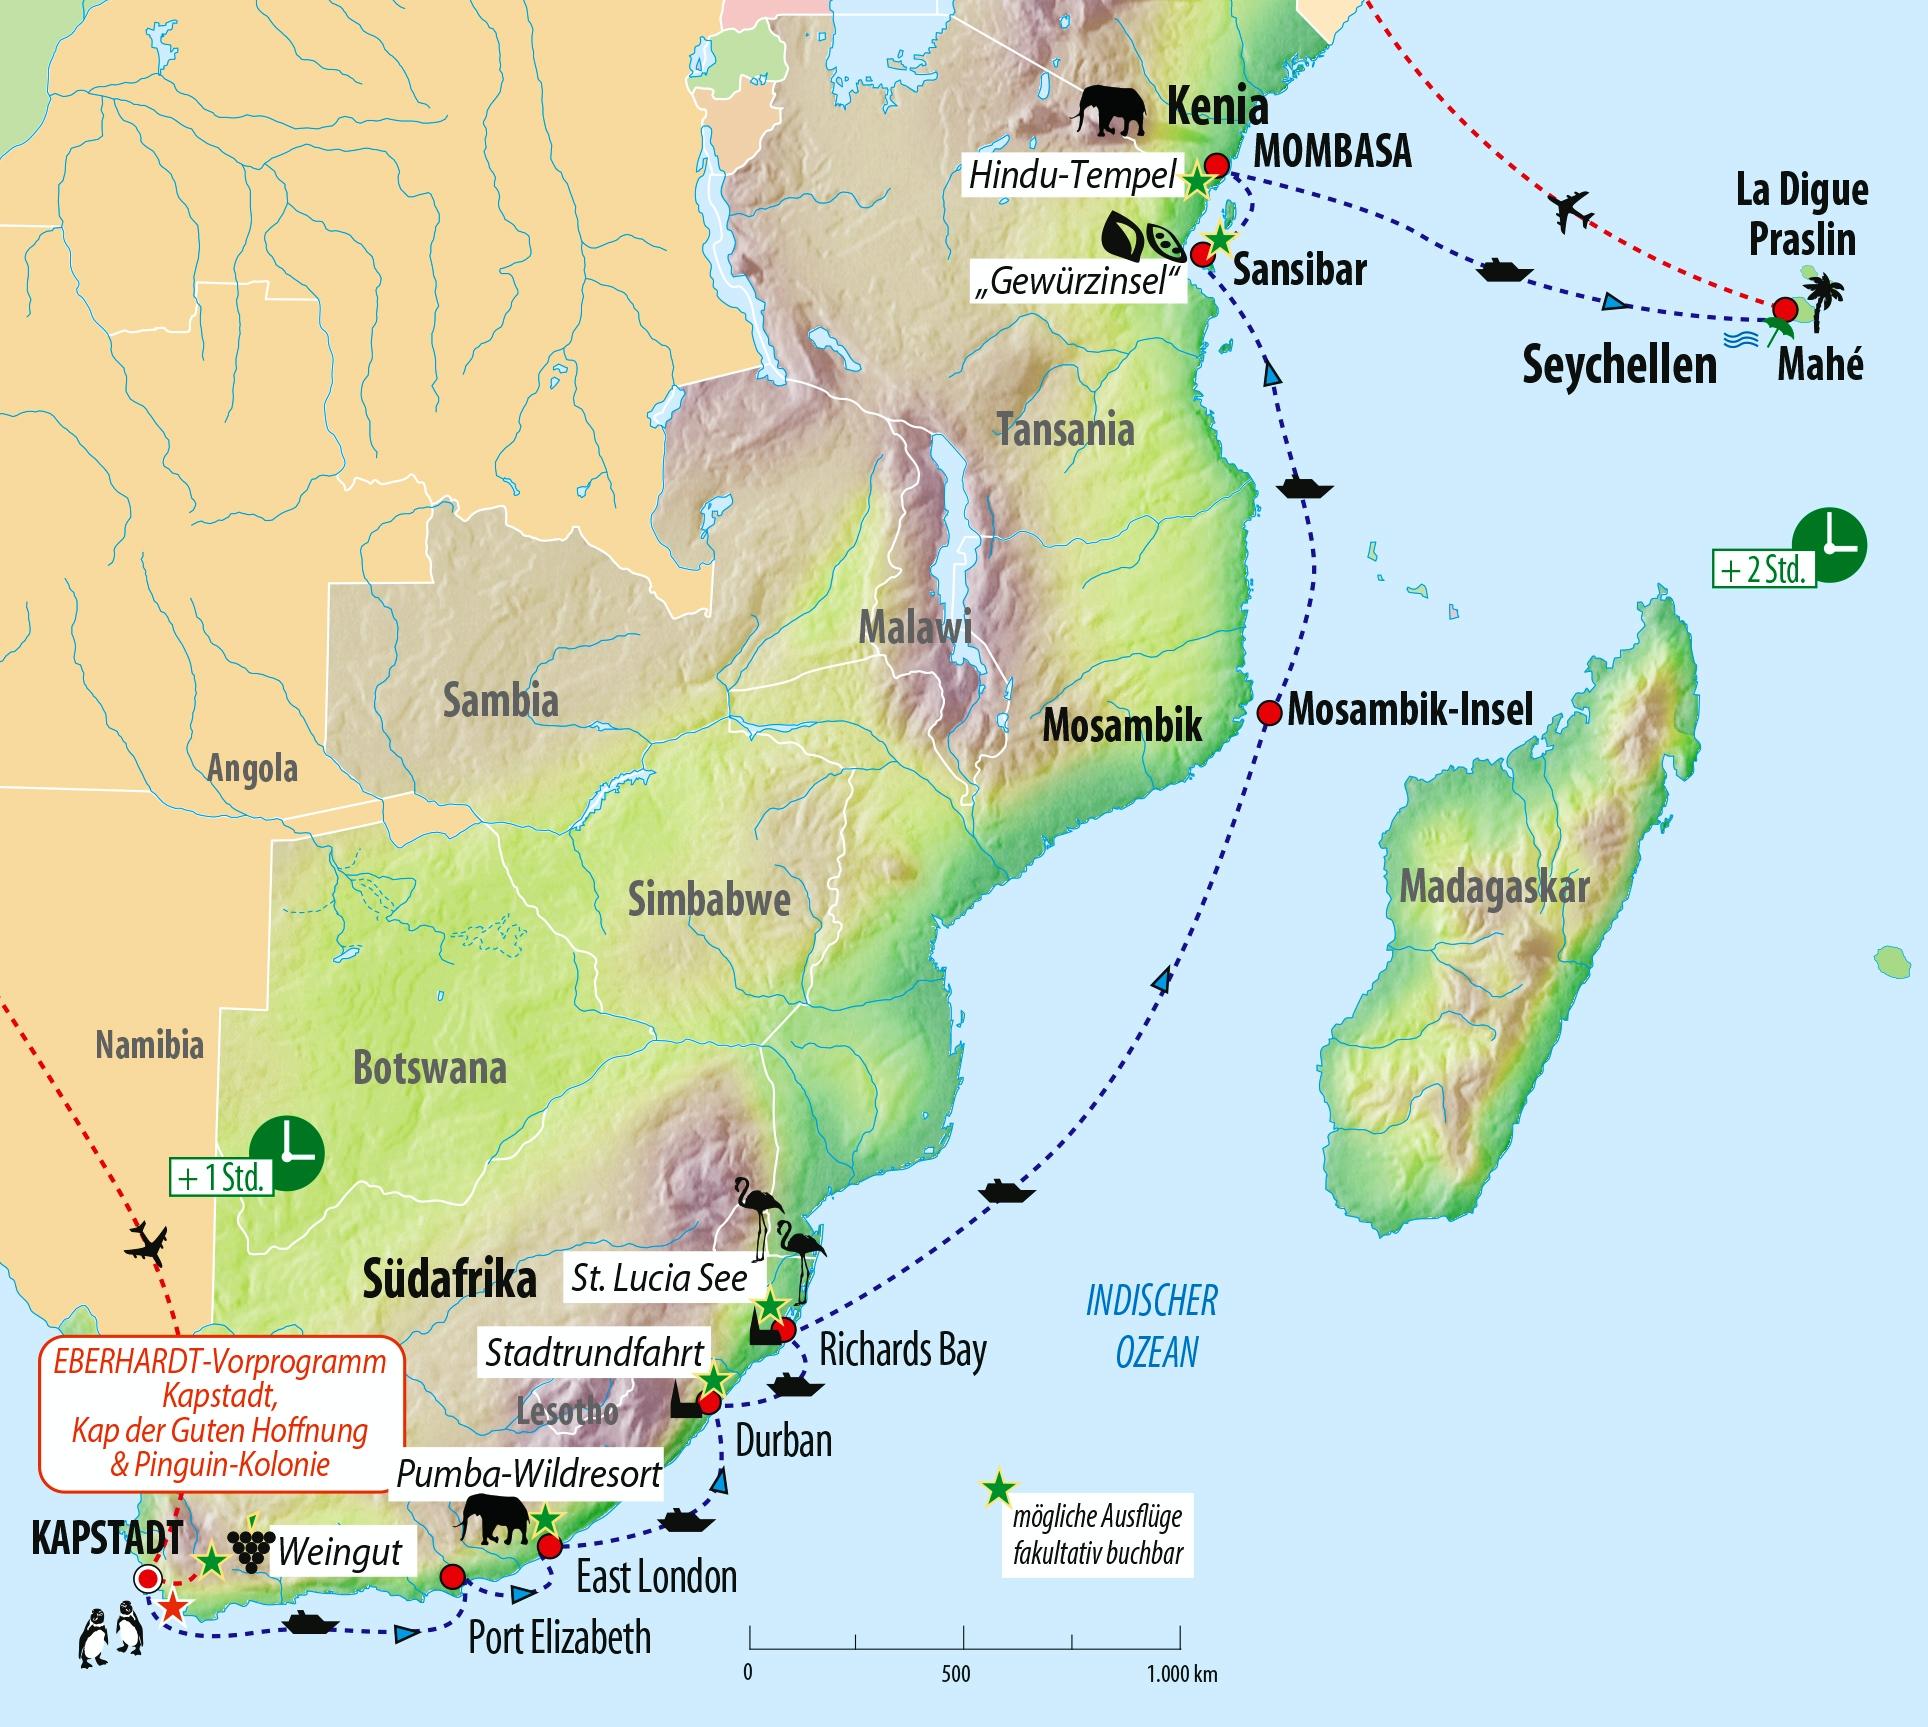 Seychellen Karte Afrika.Kreuzfahrt Südafrika Sansibar Kenia Und Seychellen Mit Ms Albatros